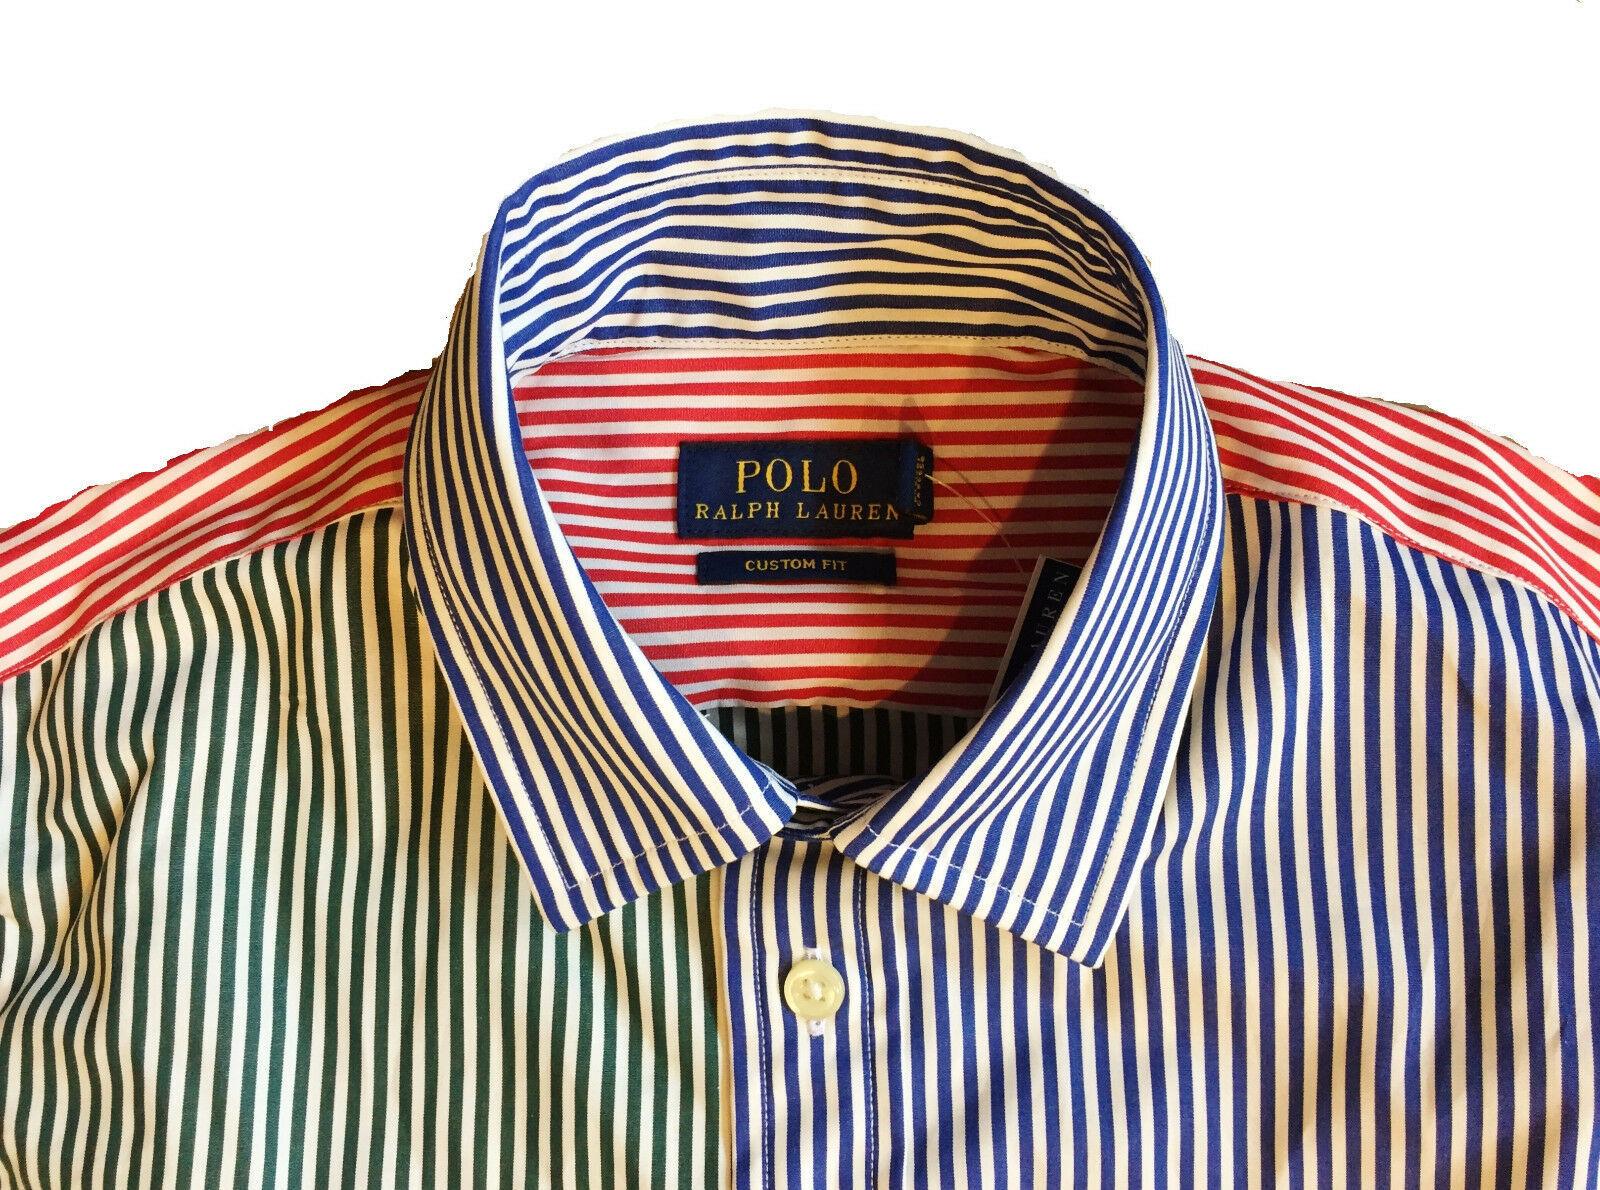 ralph lauren multi colored Patchwork Custom Fit Oxford Shirt  Sizes 0, 2, 8, 10